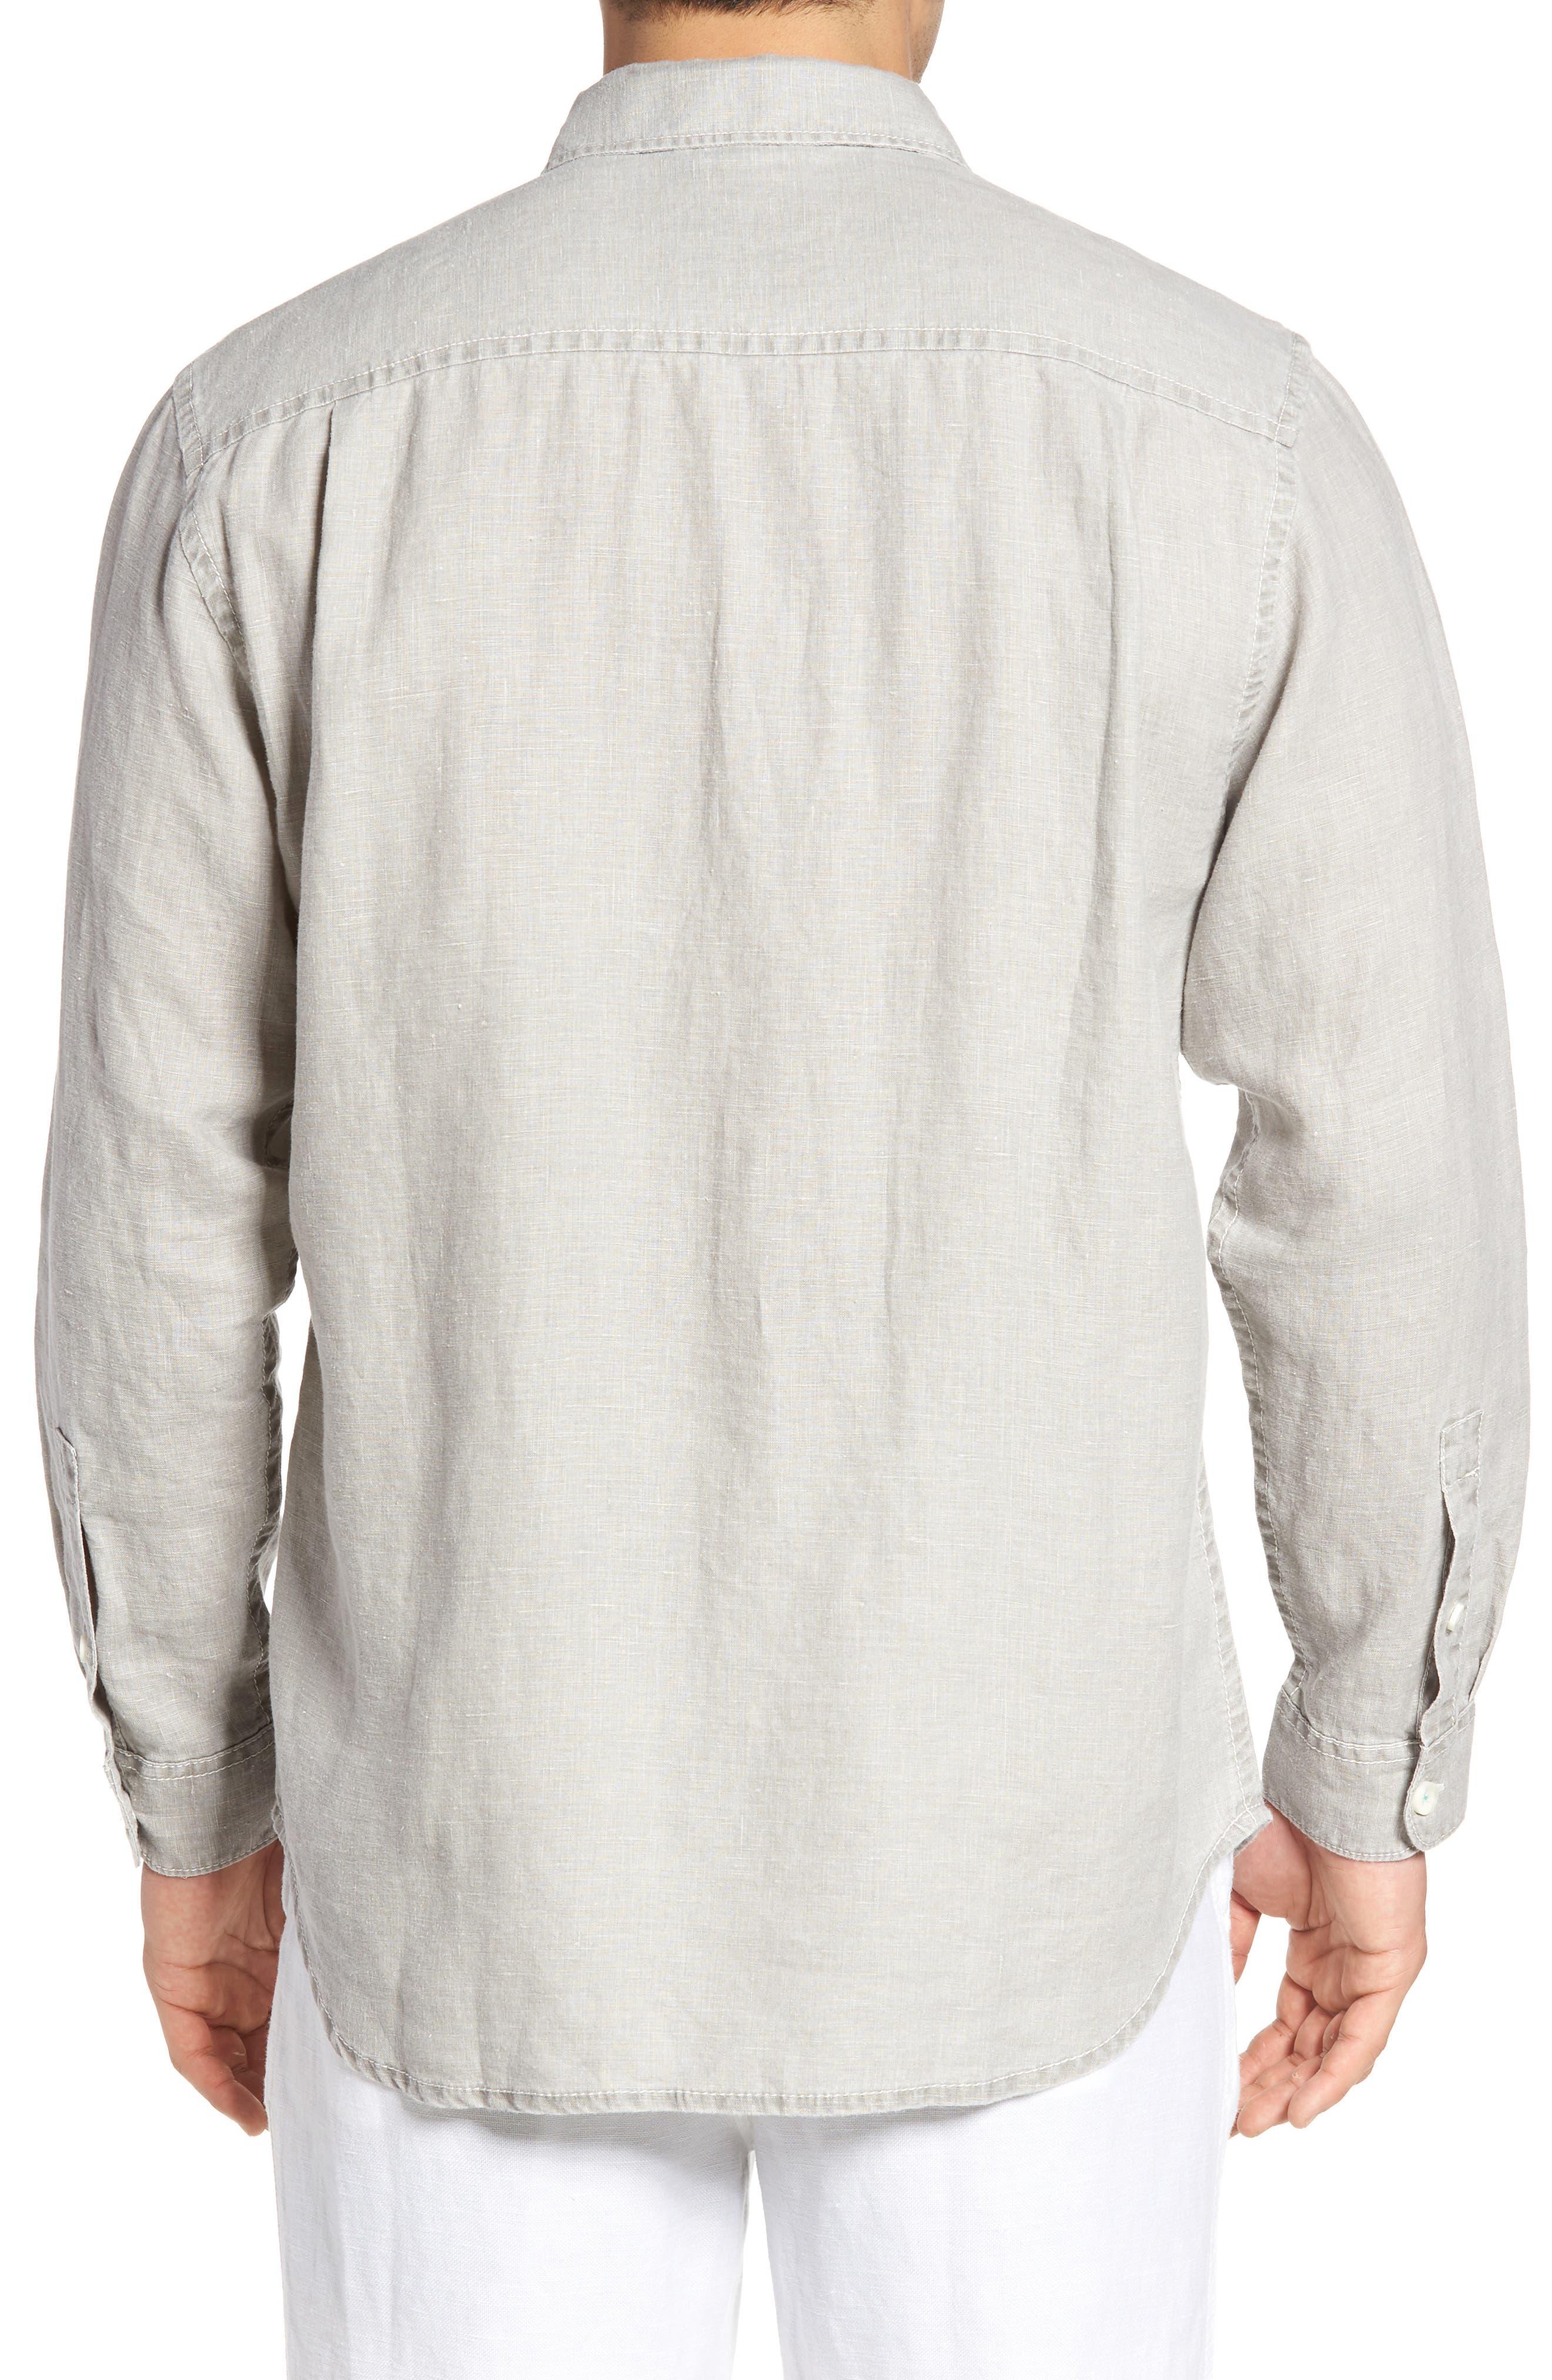 TOMMY BAHAMA, 'Sea Glass Breezer' Original Fit Linen Shirt, Alternate thumbnail 2, color, LIGHT GREY